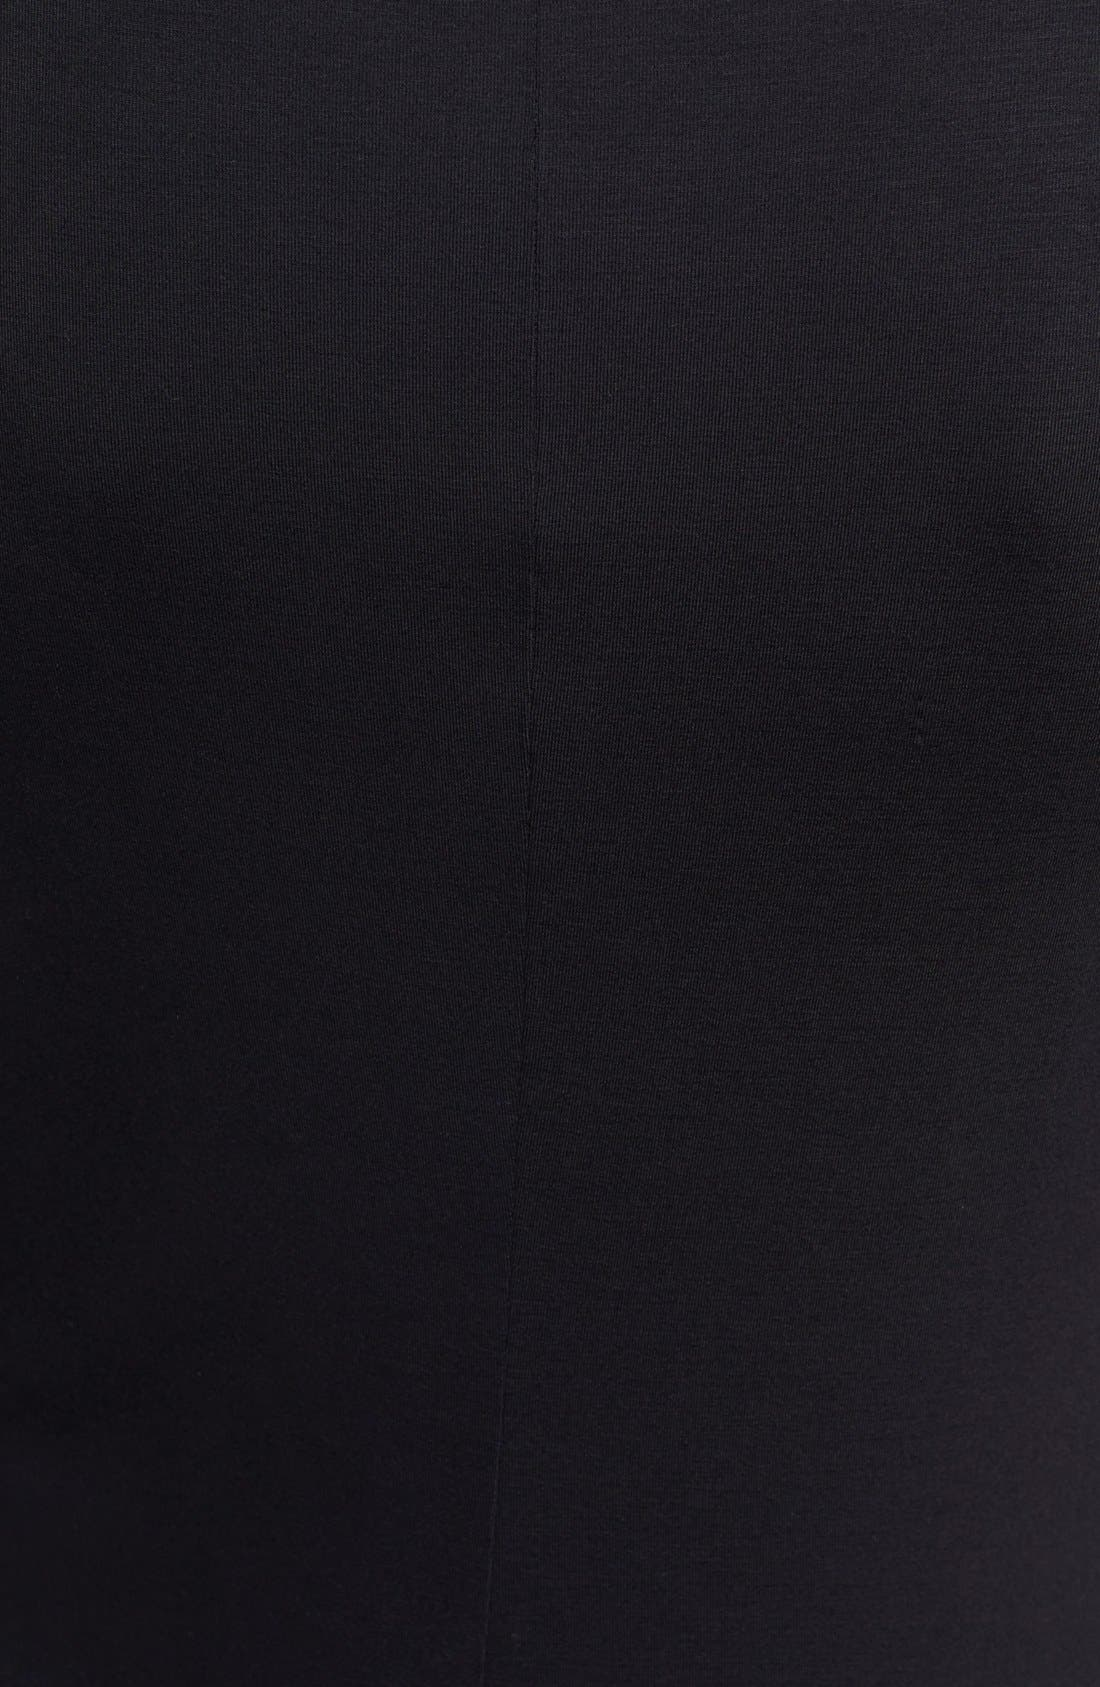 Alternate Image 3  - Trina Turk 'Bellingham 2' Jersey T-Shirt Dress